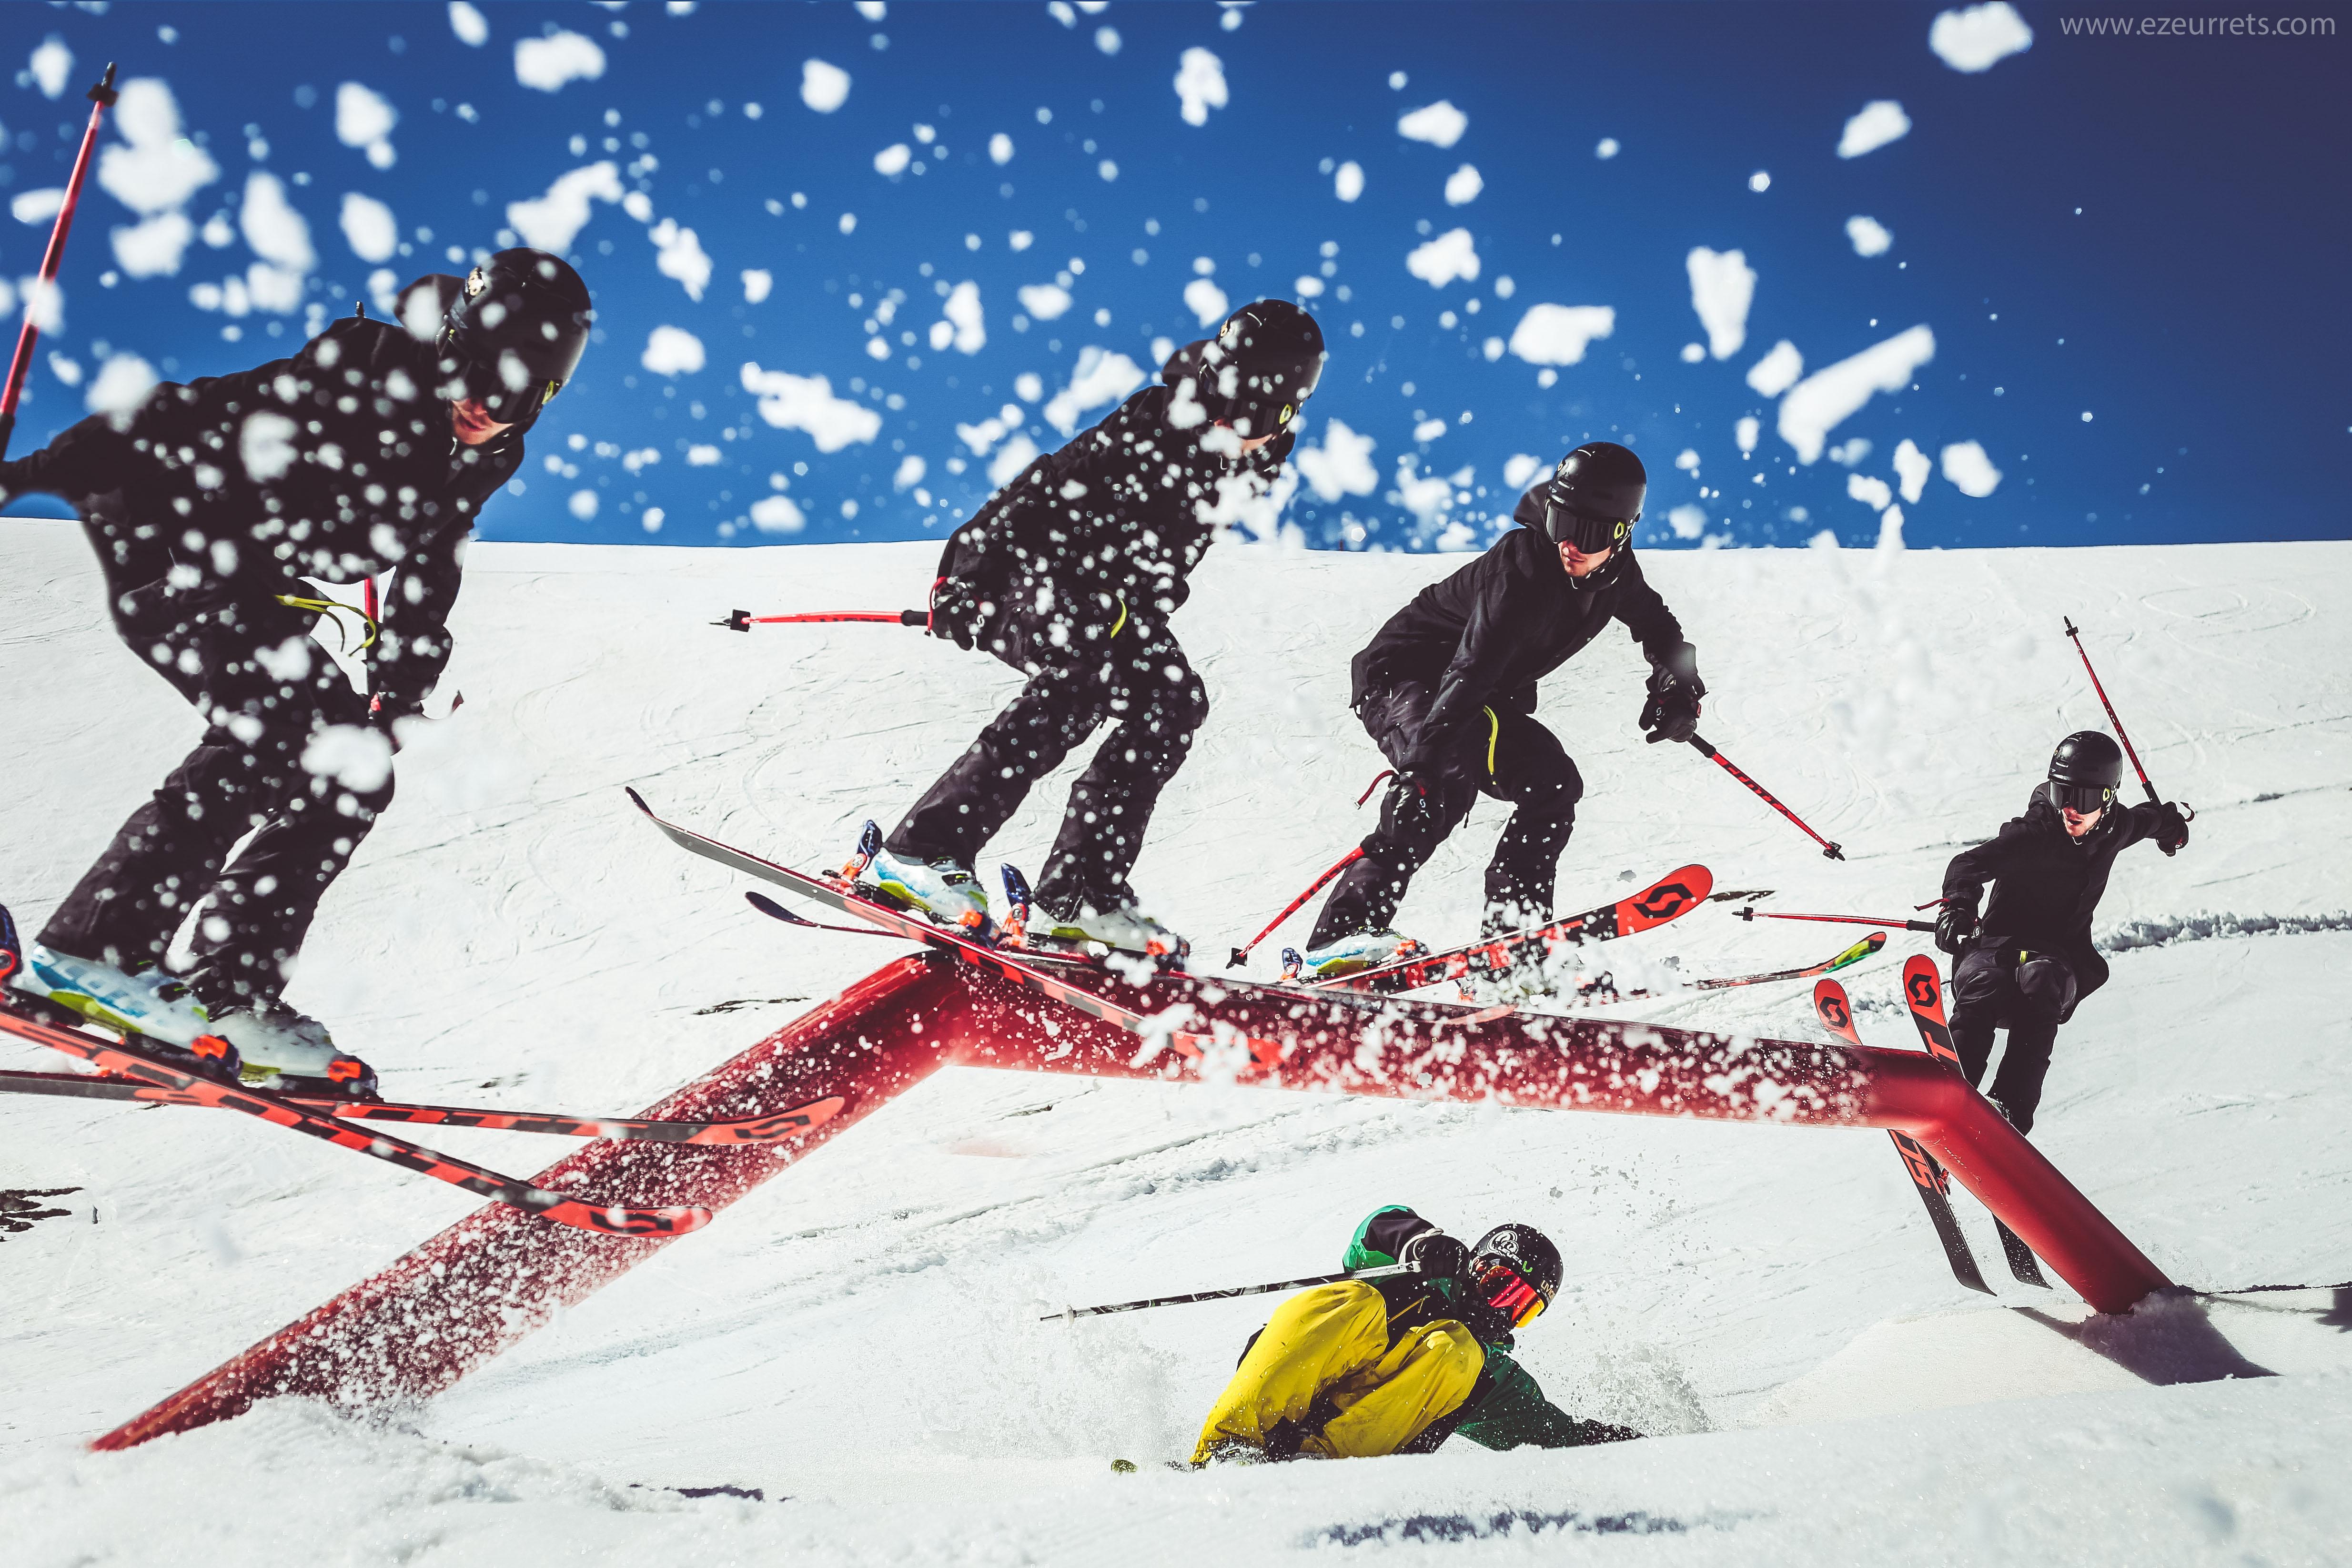 Evoluzioni in slow motion sul Snowpark Mottolinol